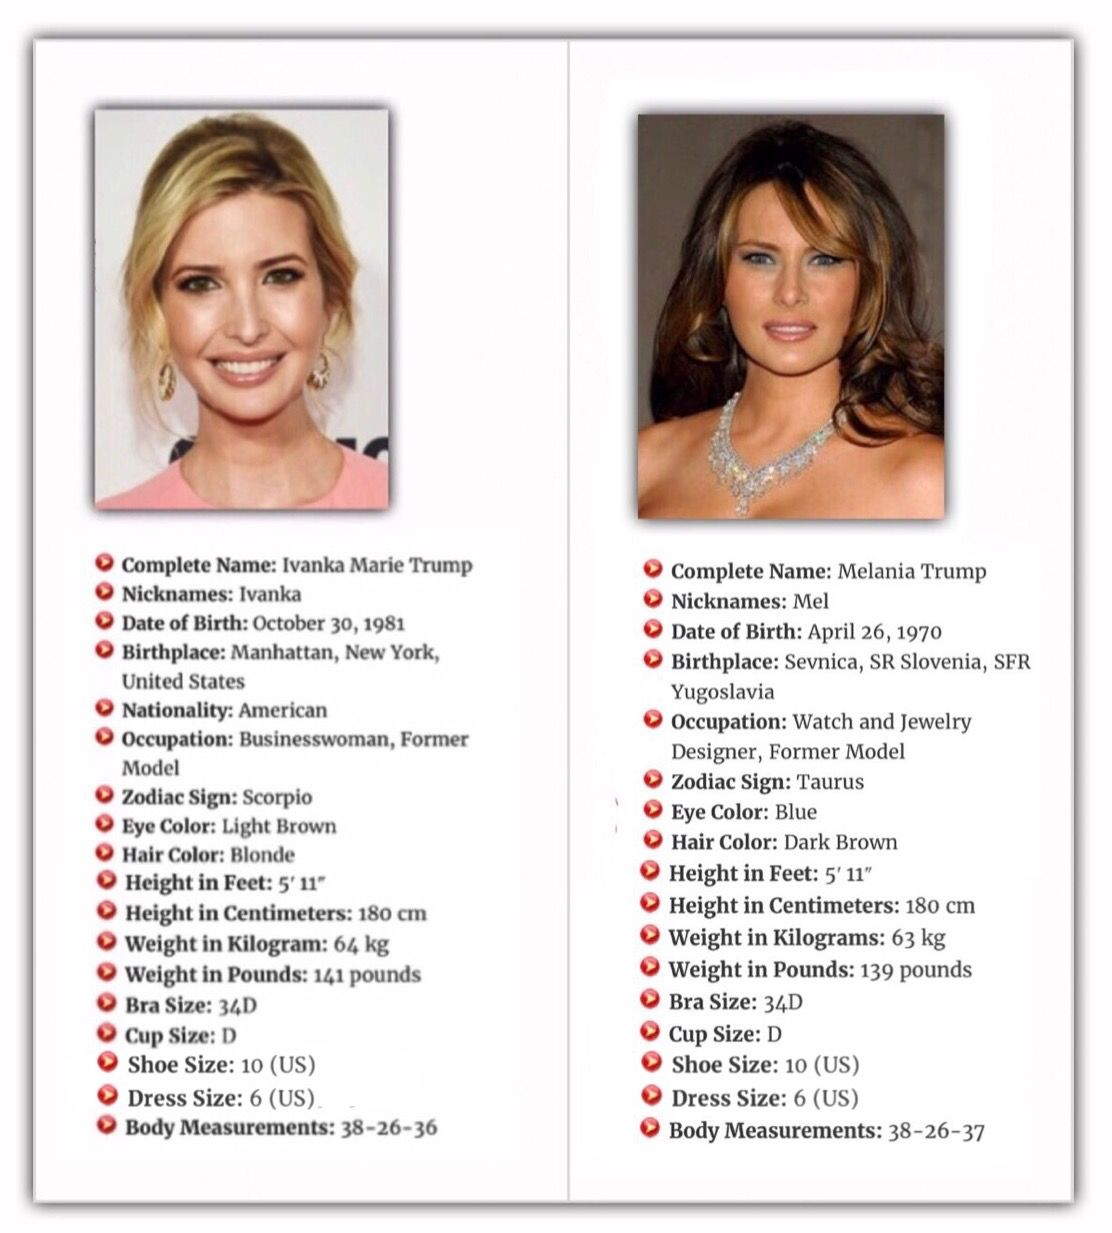 Physical Similarities Between Melania Ivanka Trump Note Height Weight Shoe Dress Sizes An Ivanka Trump Photos Ivanka Marie Trump Ivanka Trump Bikini